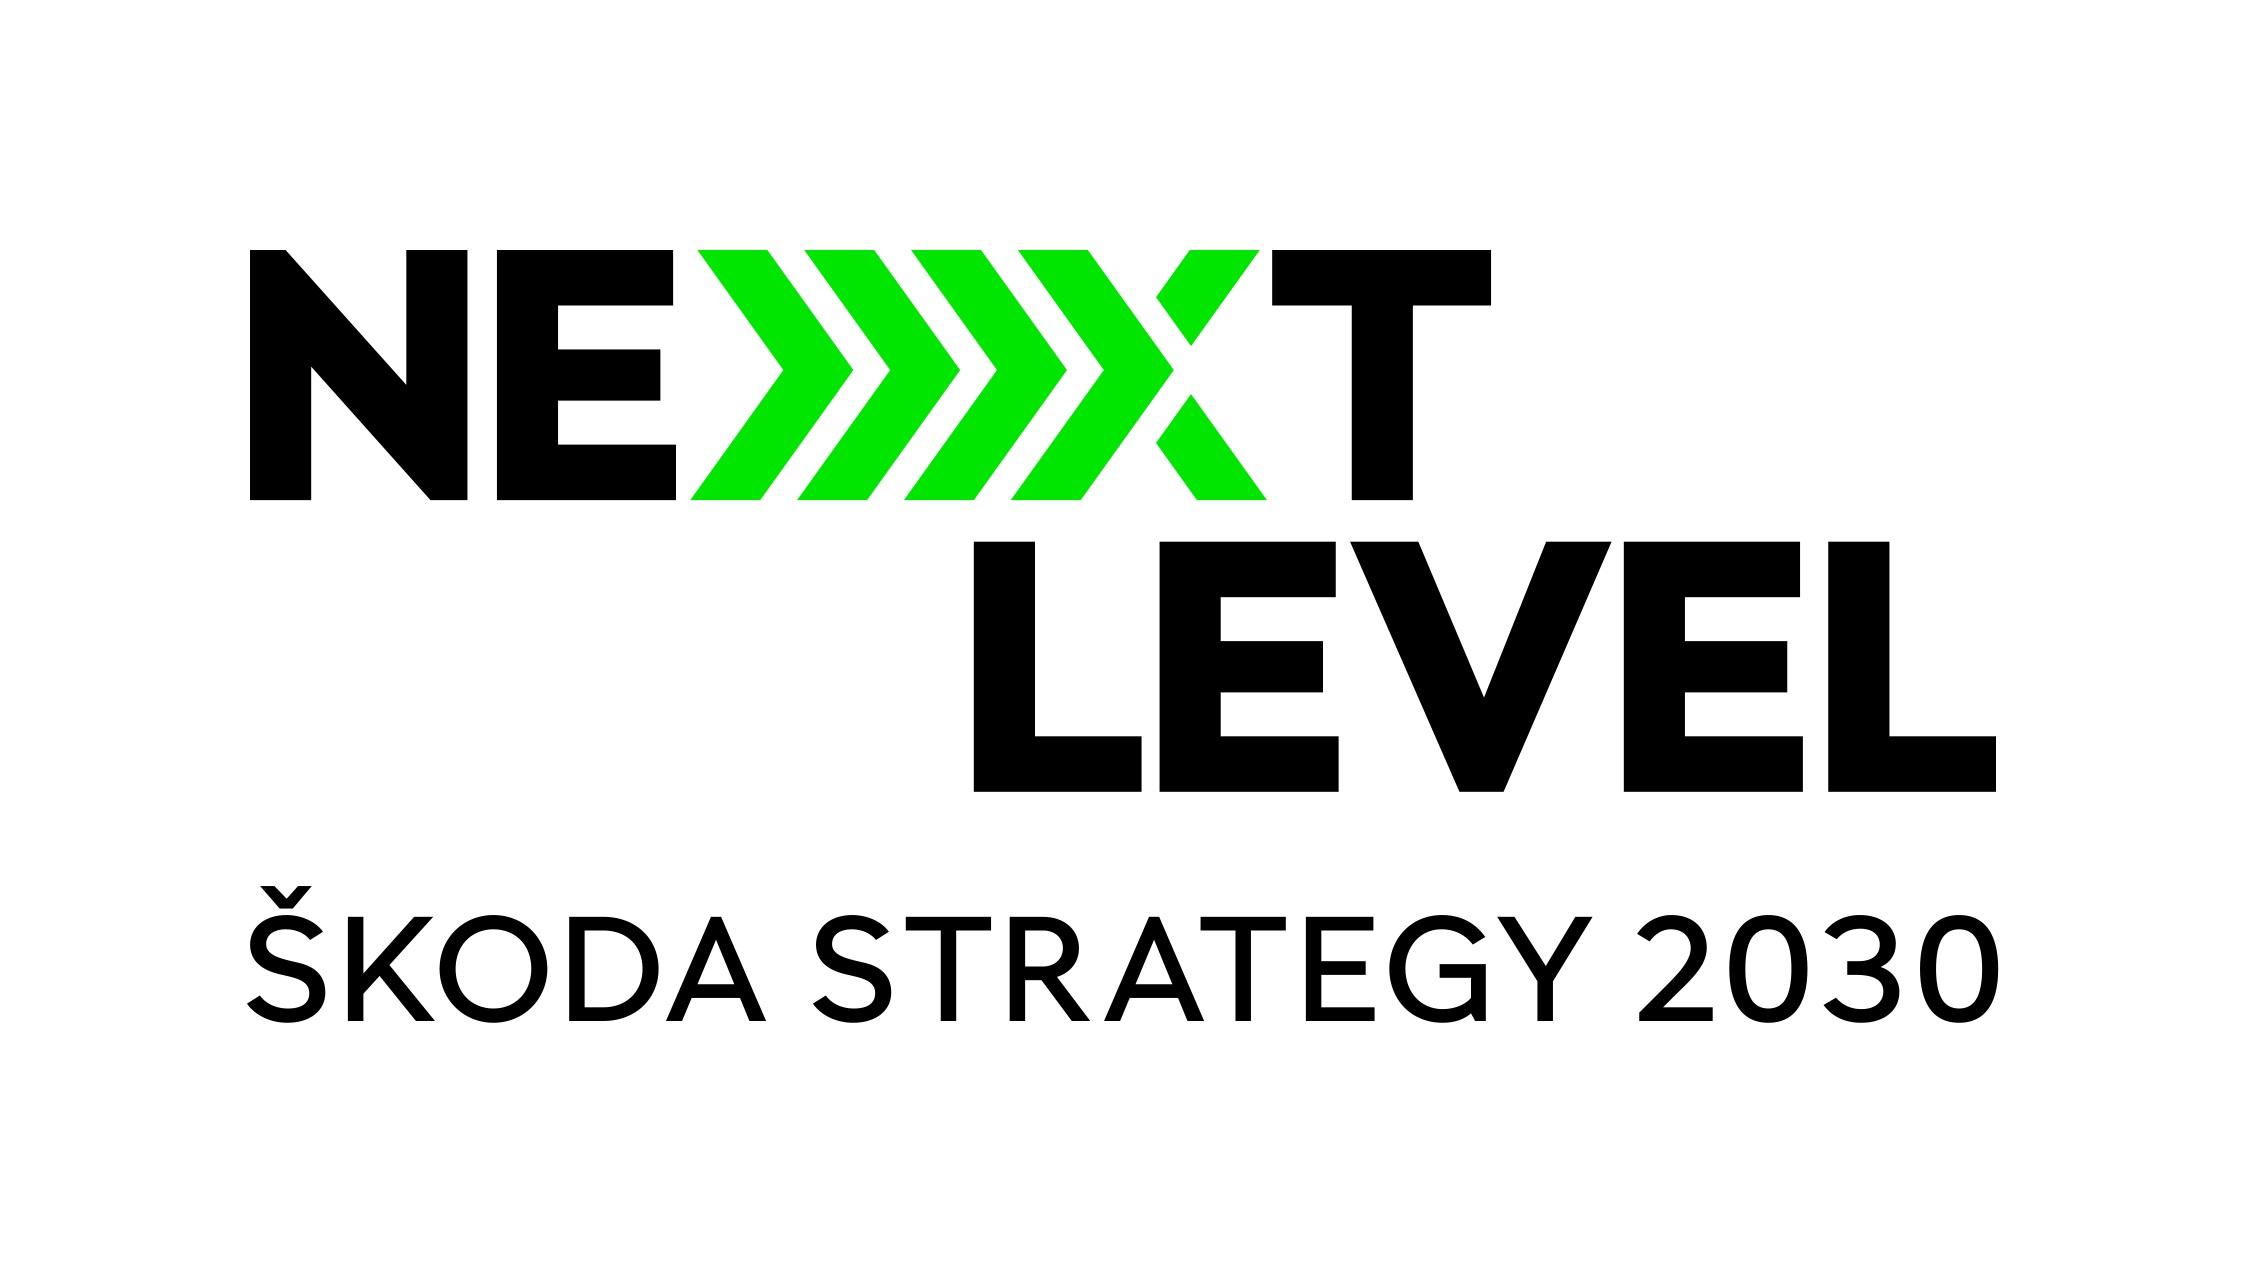 210617-skoda_strategy-2030.jpg